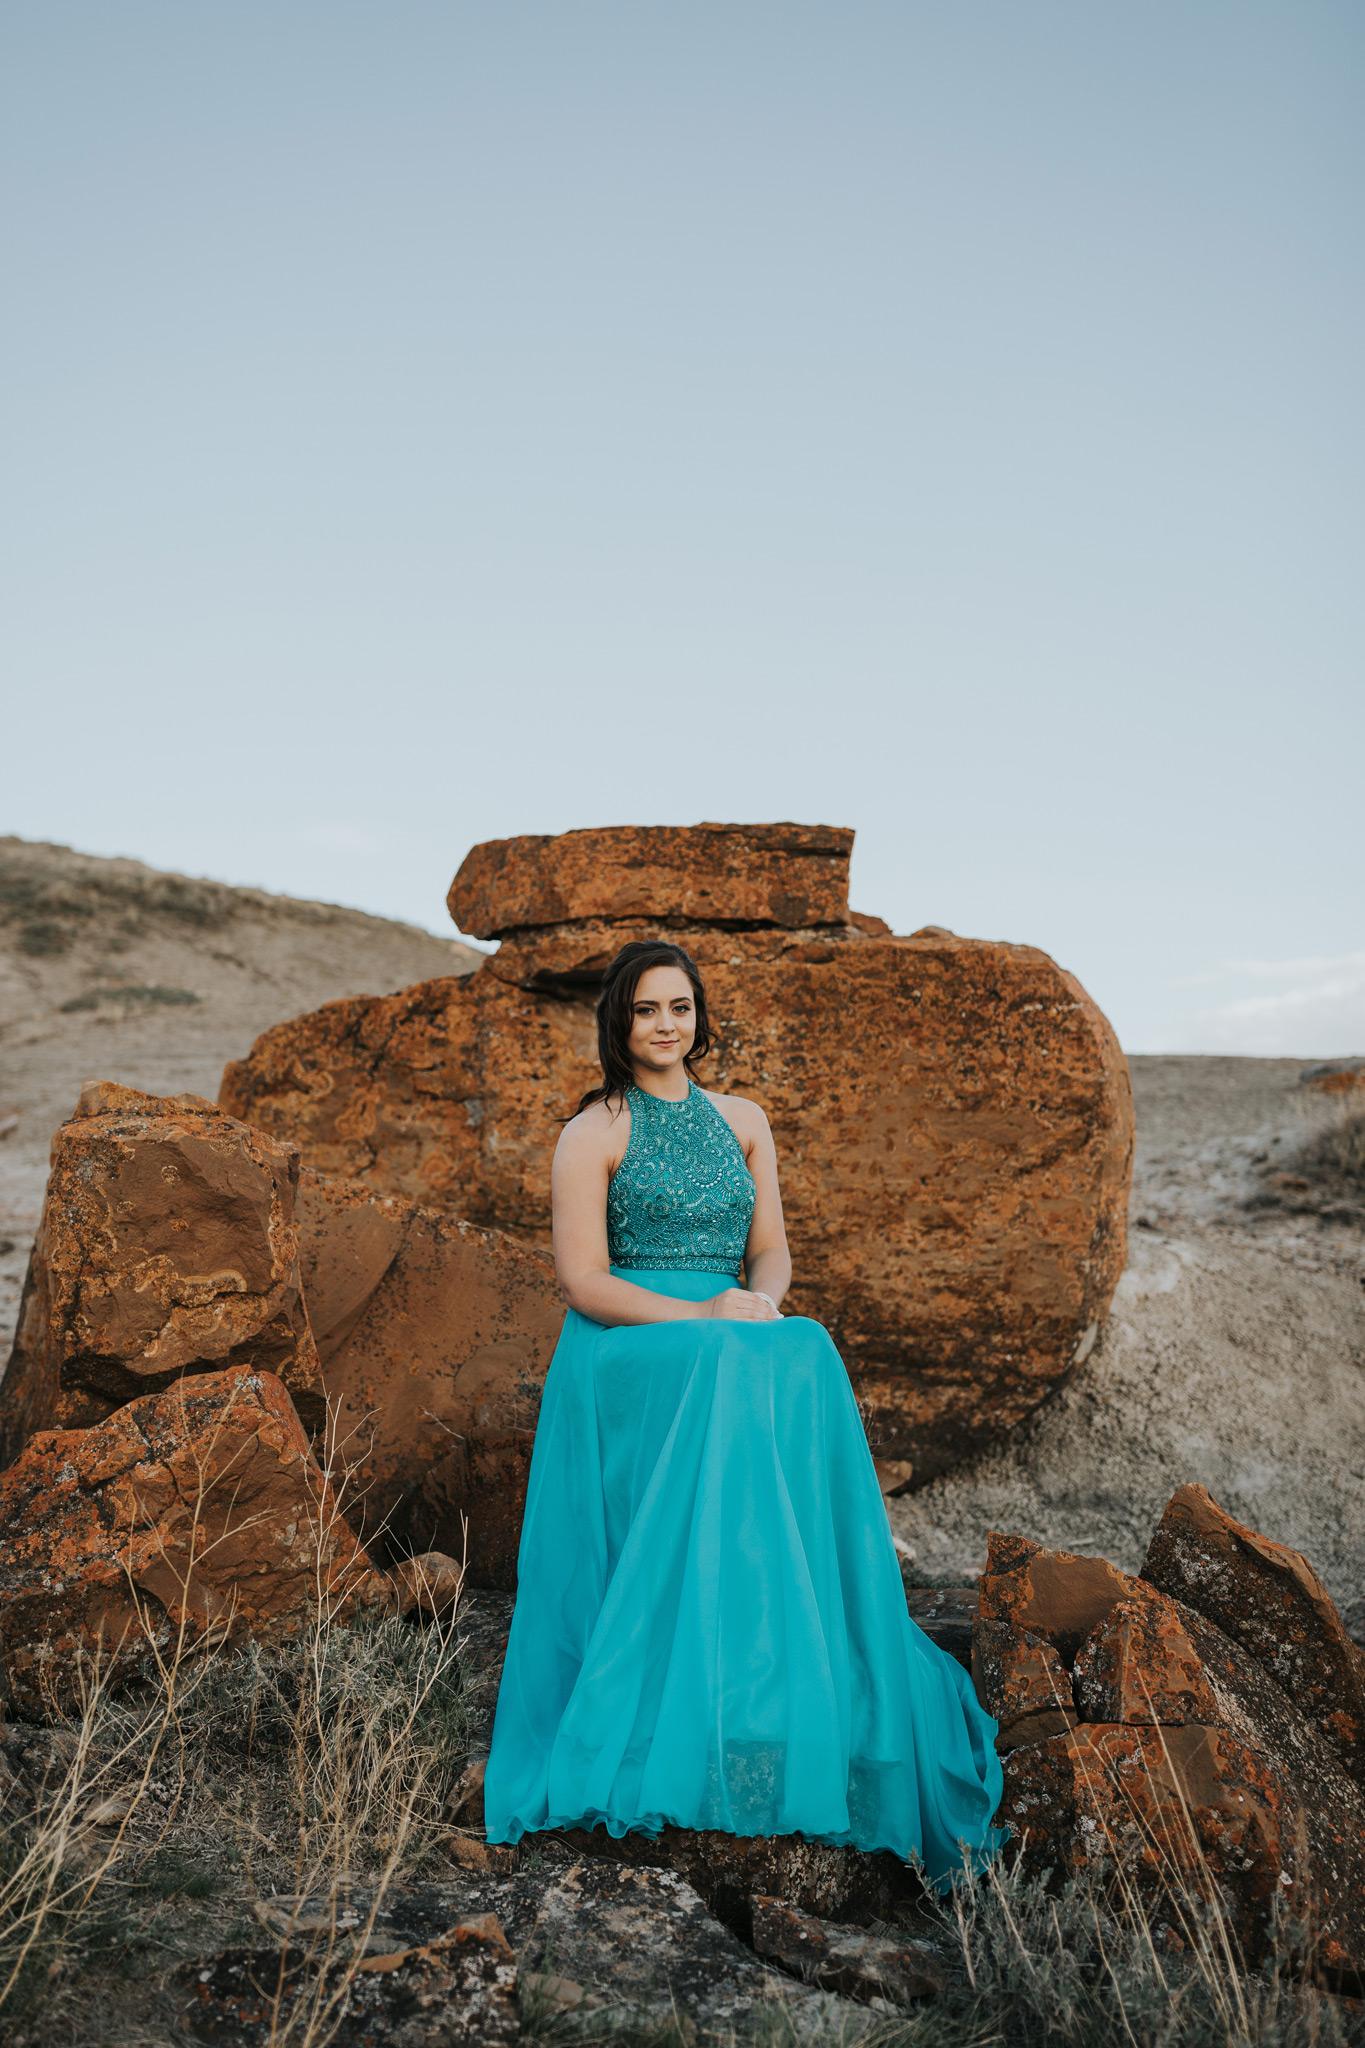 grad girl sitting on rocks resembling a throne